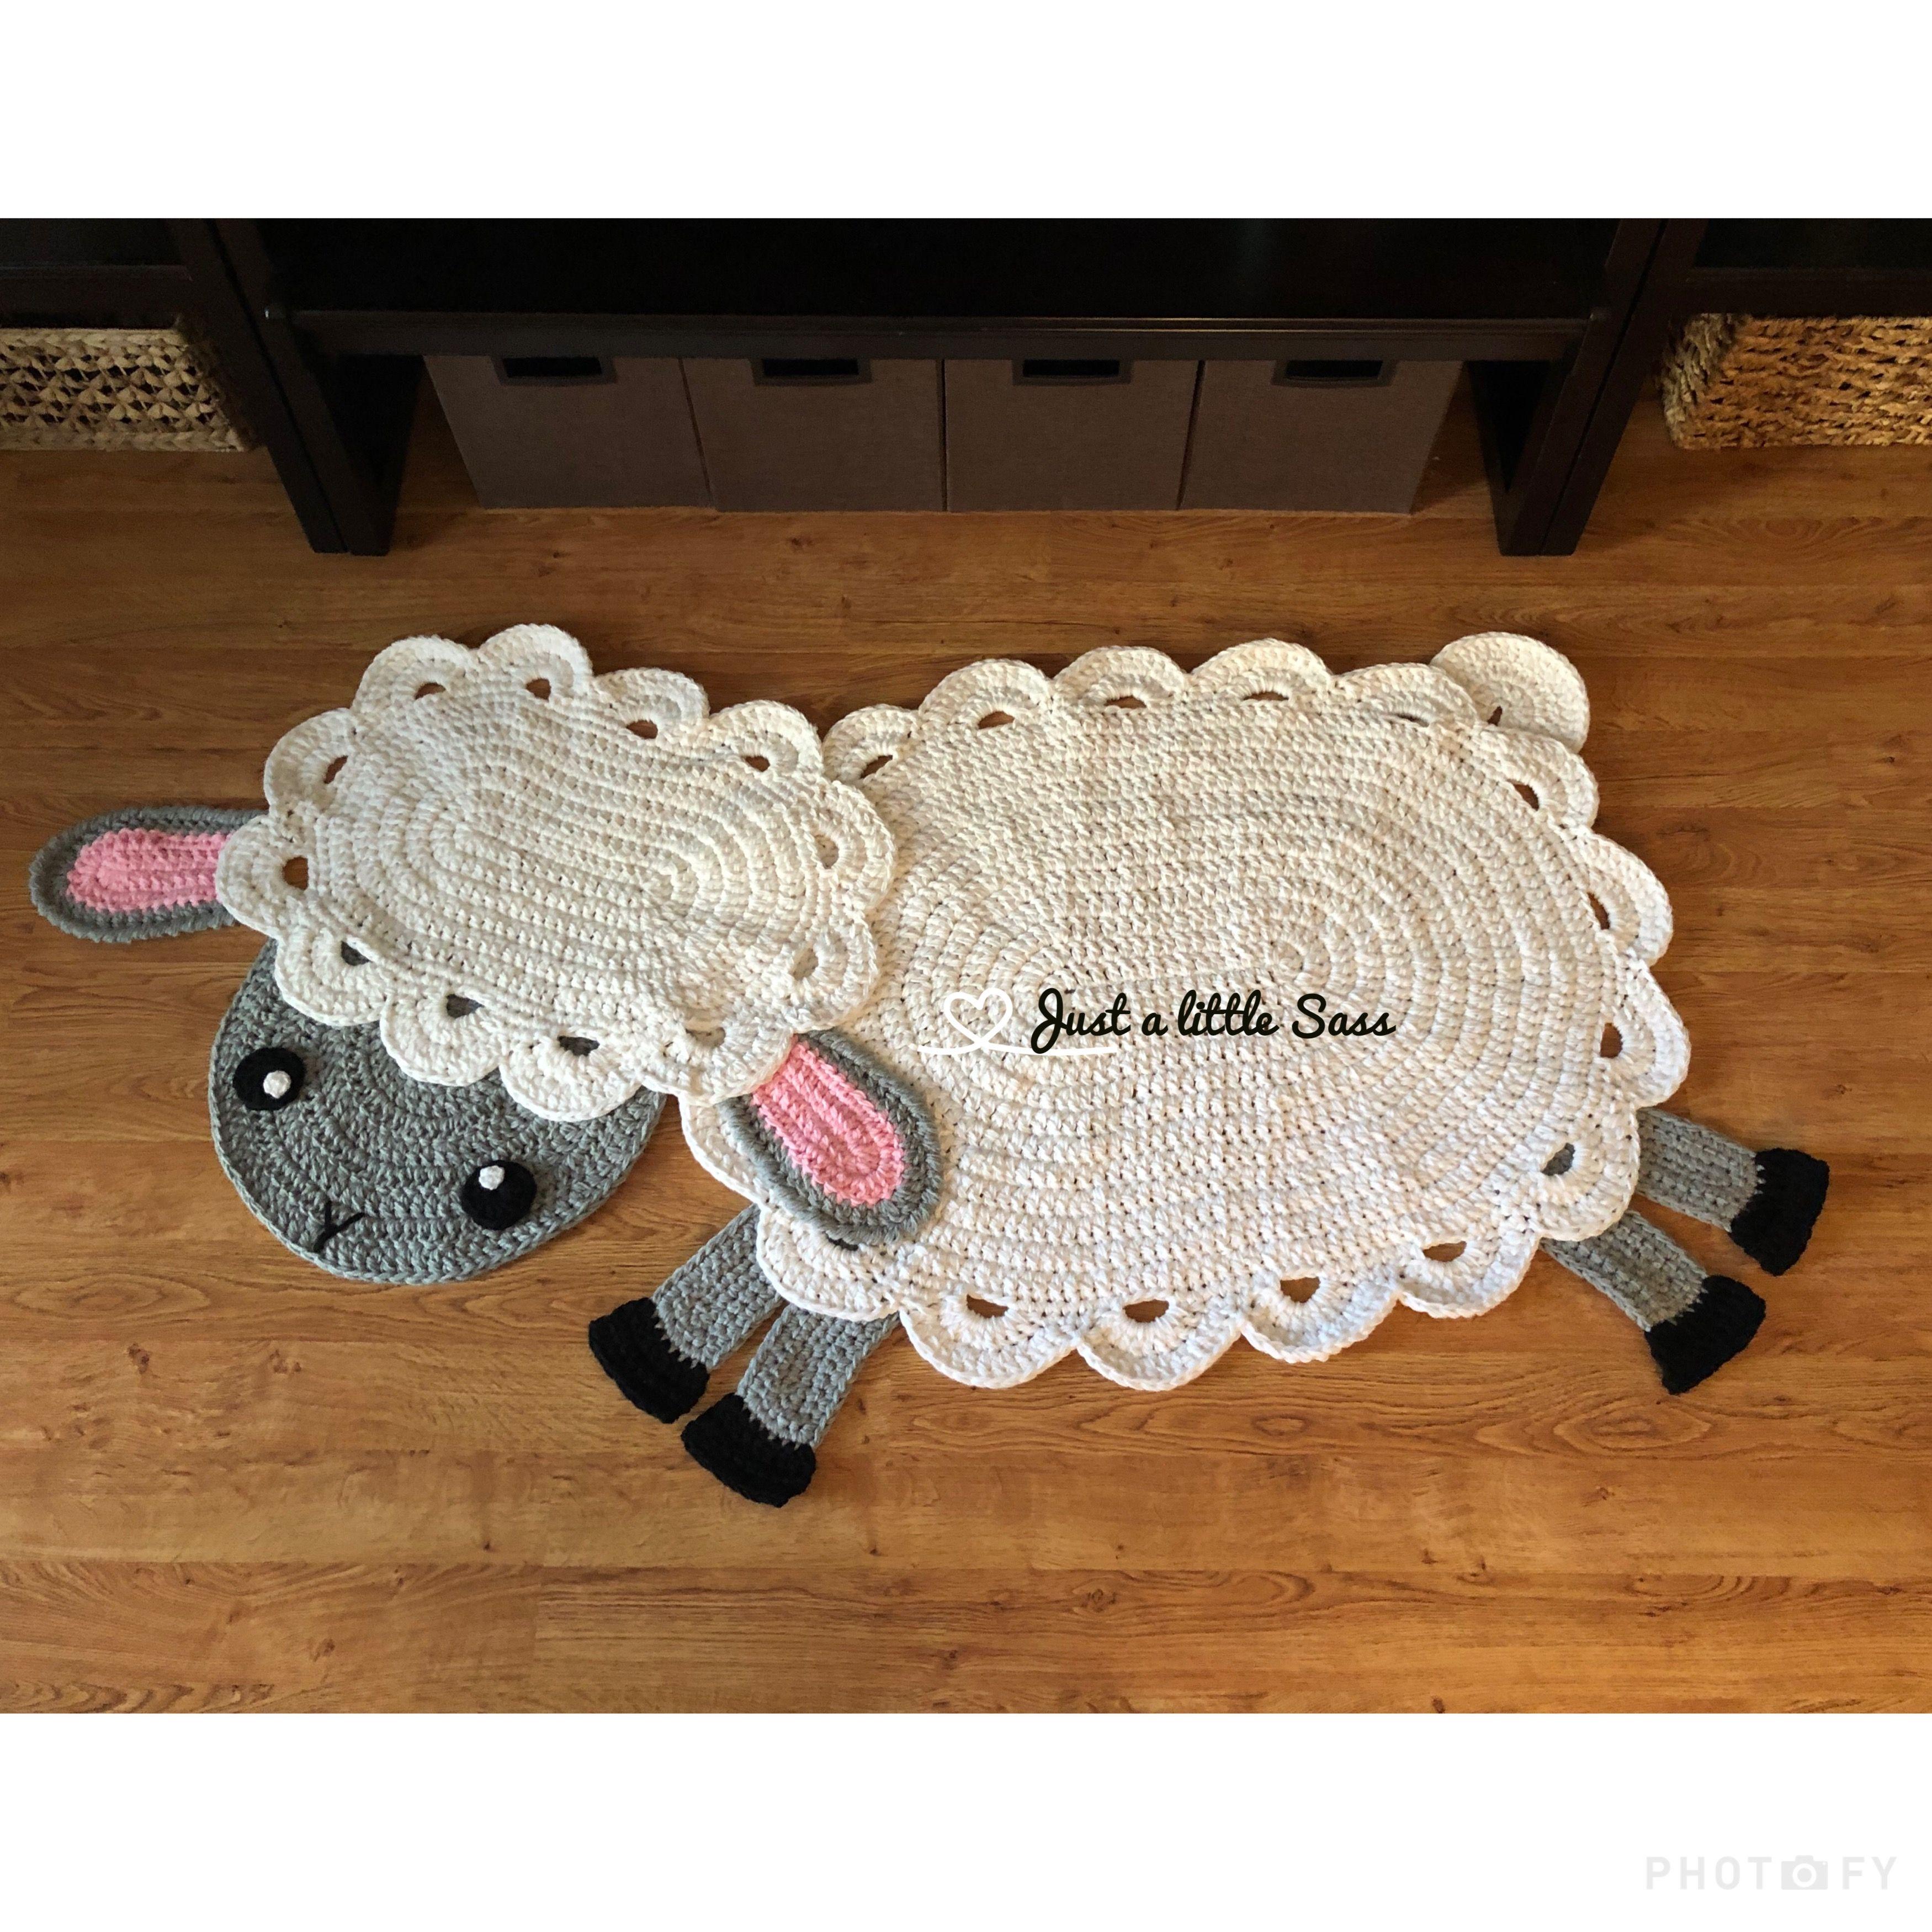 Disney Cars Crocheted Afghan Afghans Throw Blanket Racing To You So Cute Crochet Square Blanket Crochet Afghan Baby Afghan Crochet